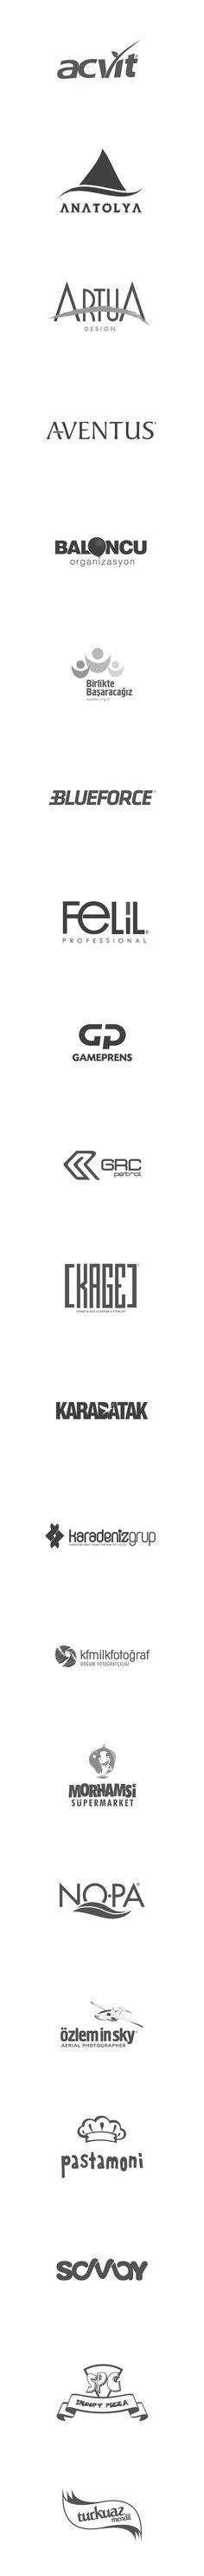 Logos Designed by Sedat Gever